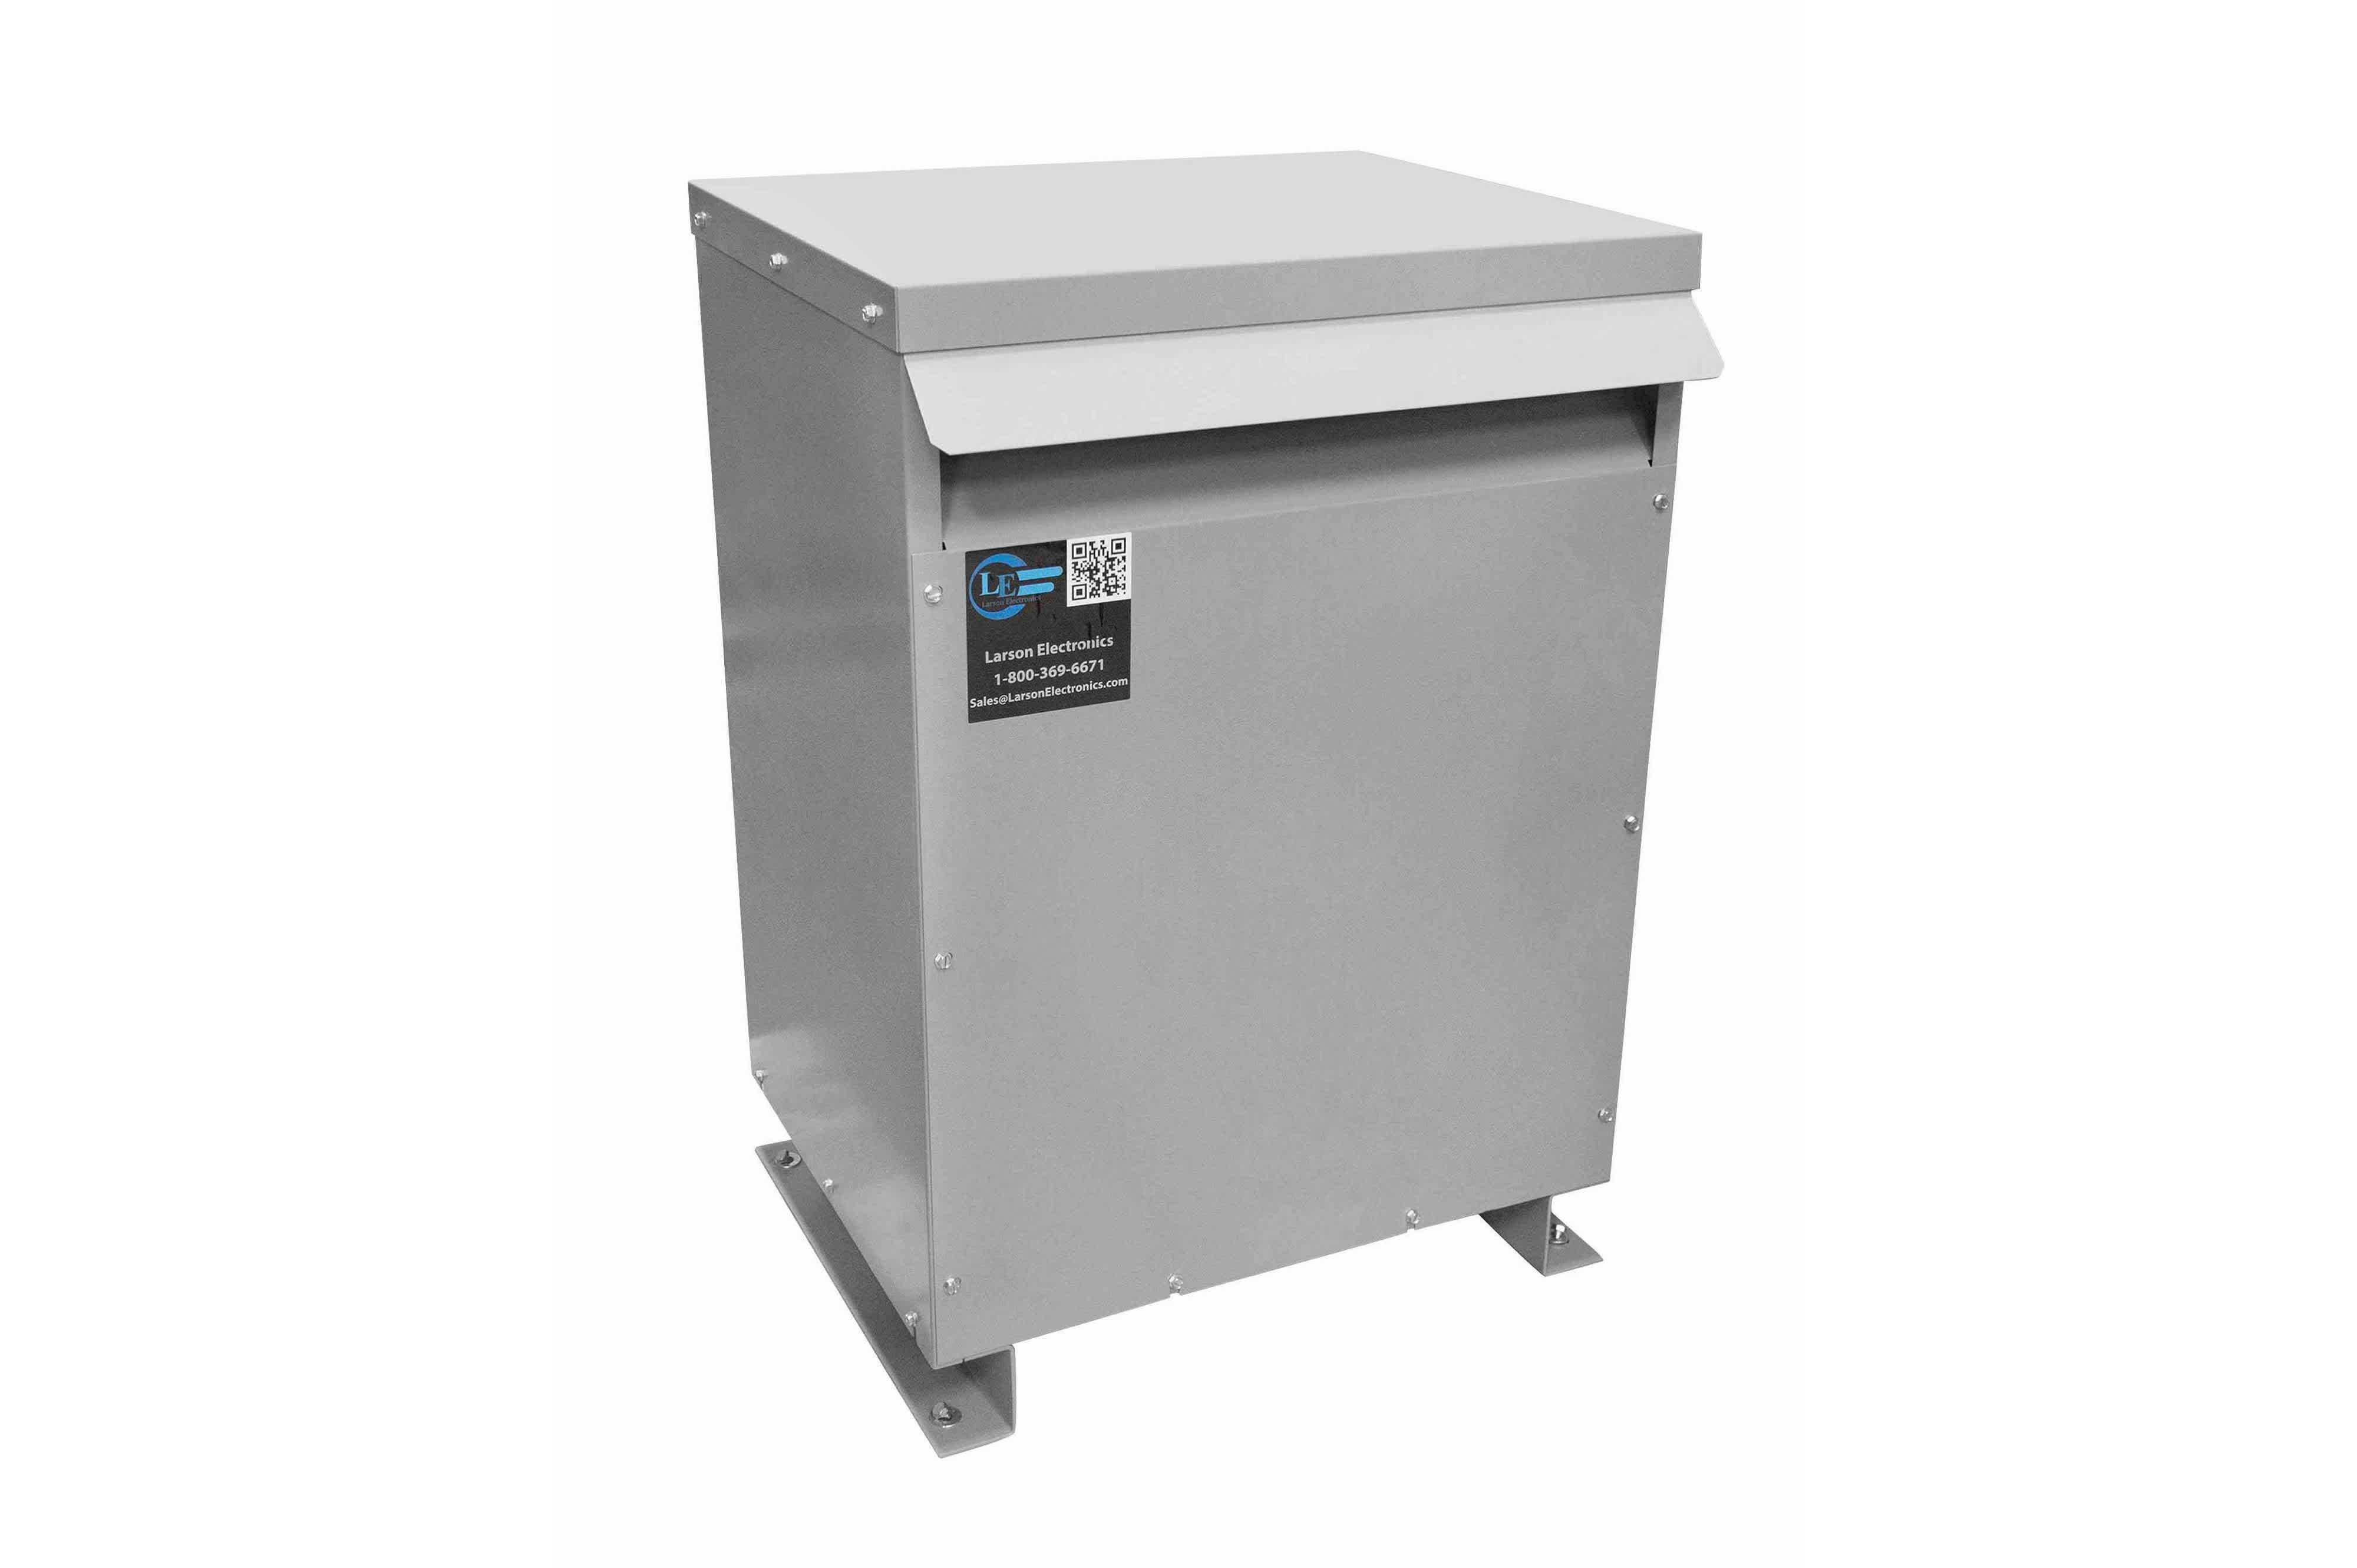 18 kVA 3PH Isolation Transformer, 575V Wye Primary, 480Y/277 Wye-N Secondary, N3R, Ventilated, 60 Hz